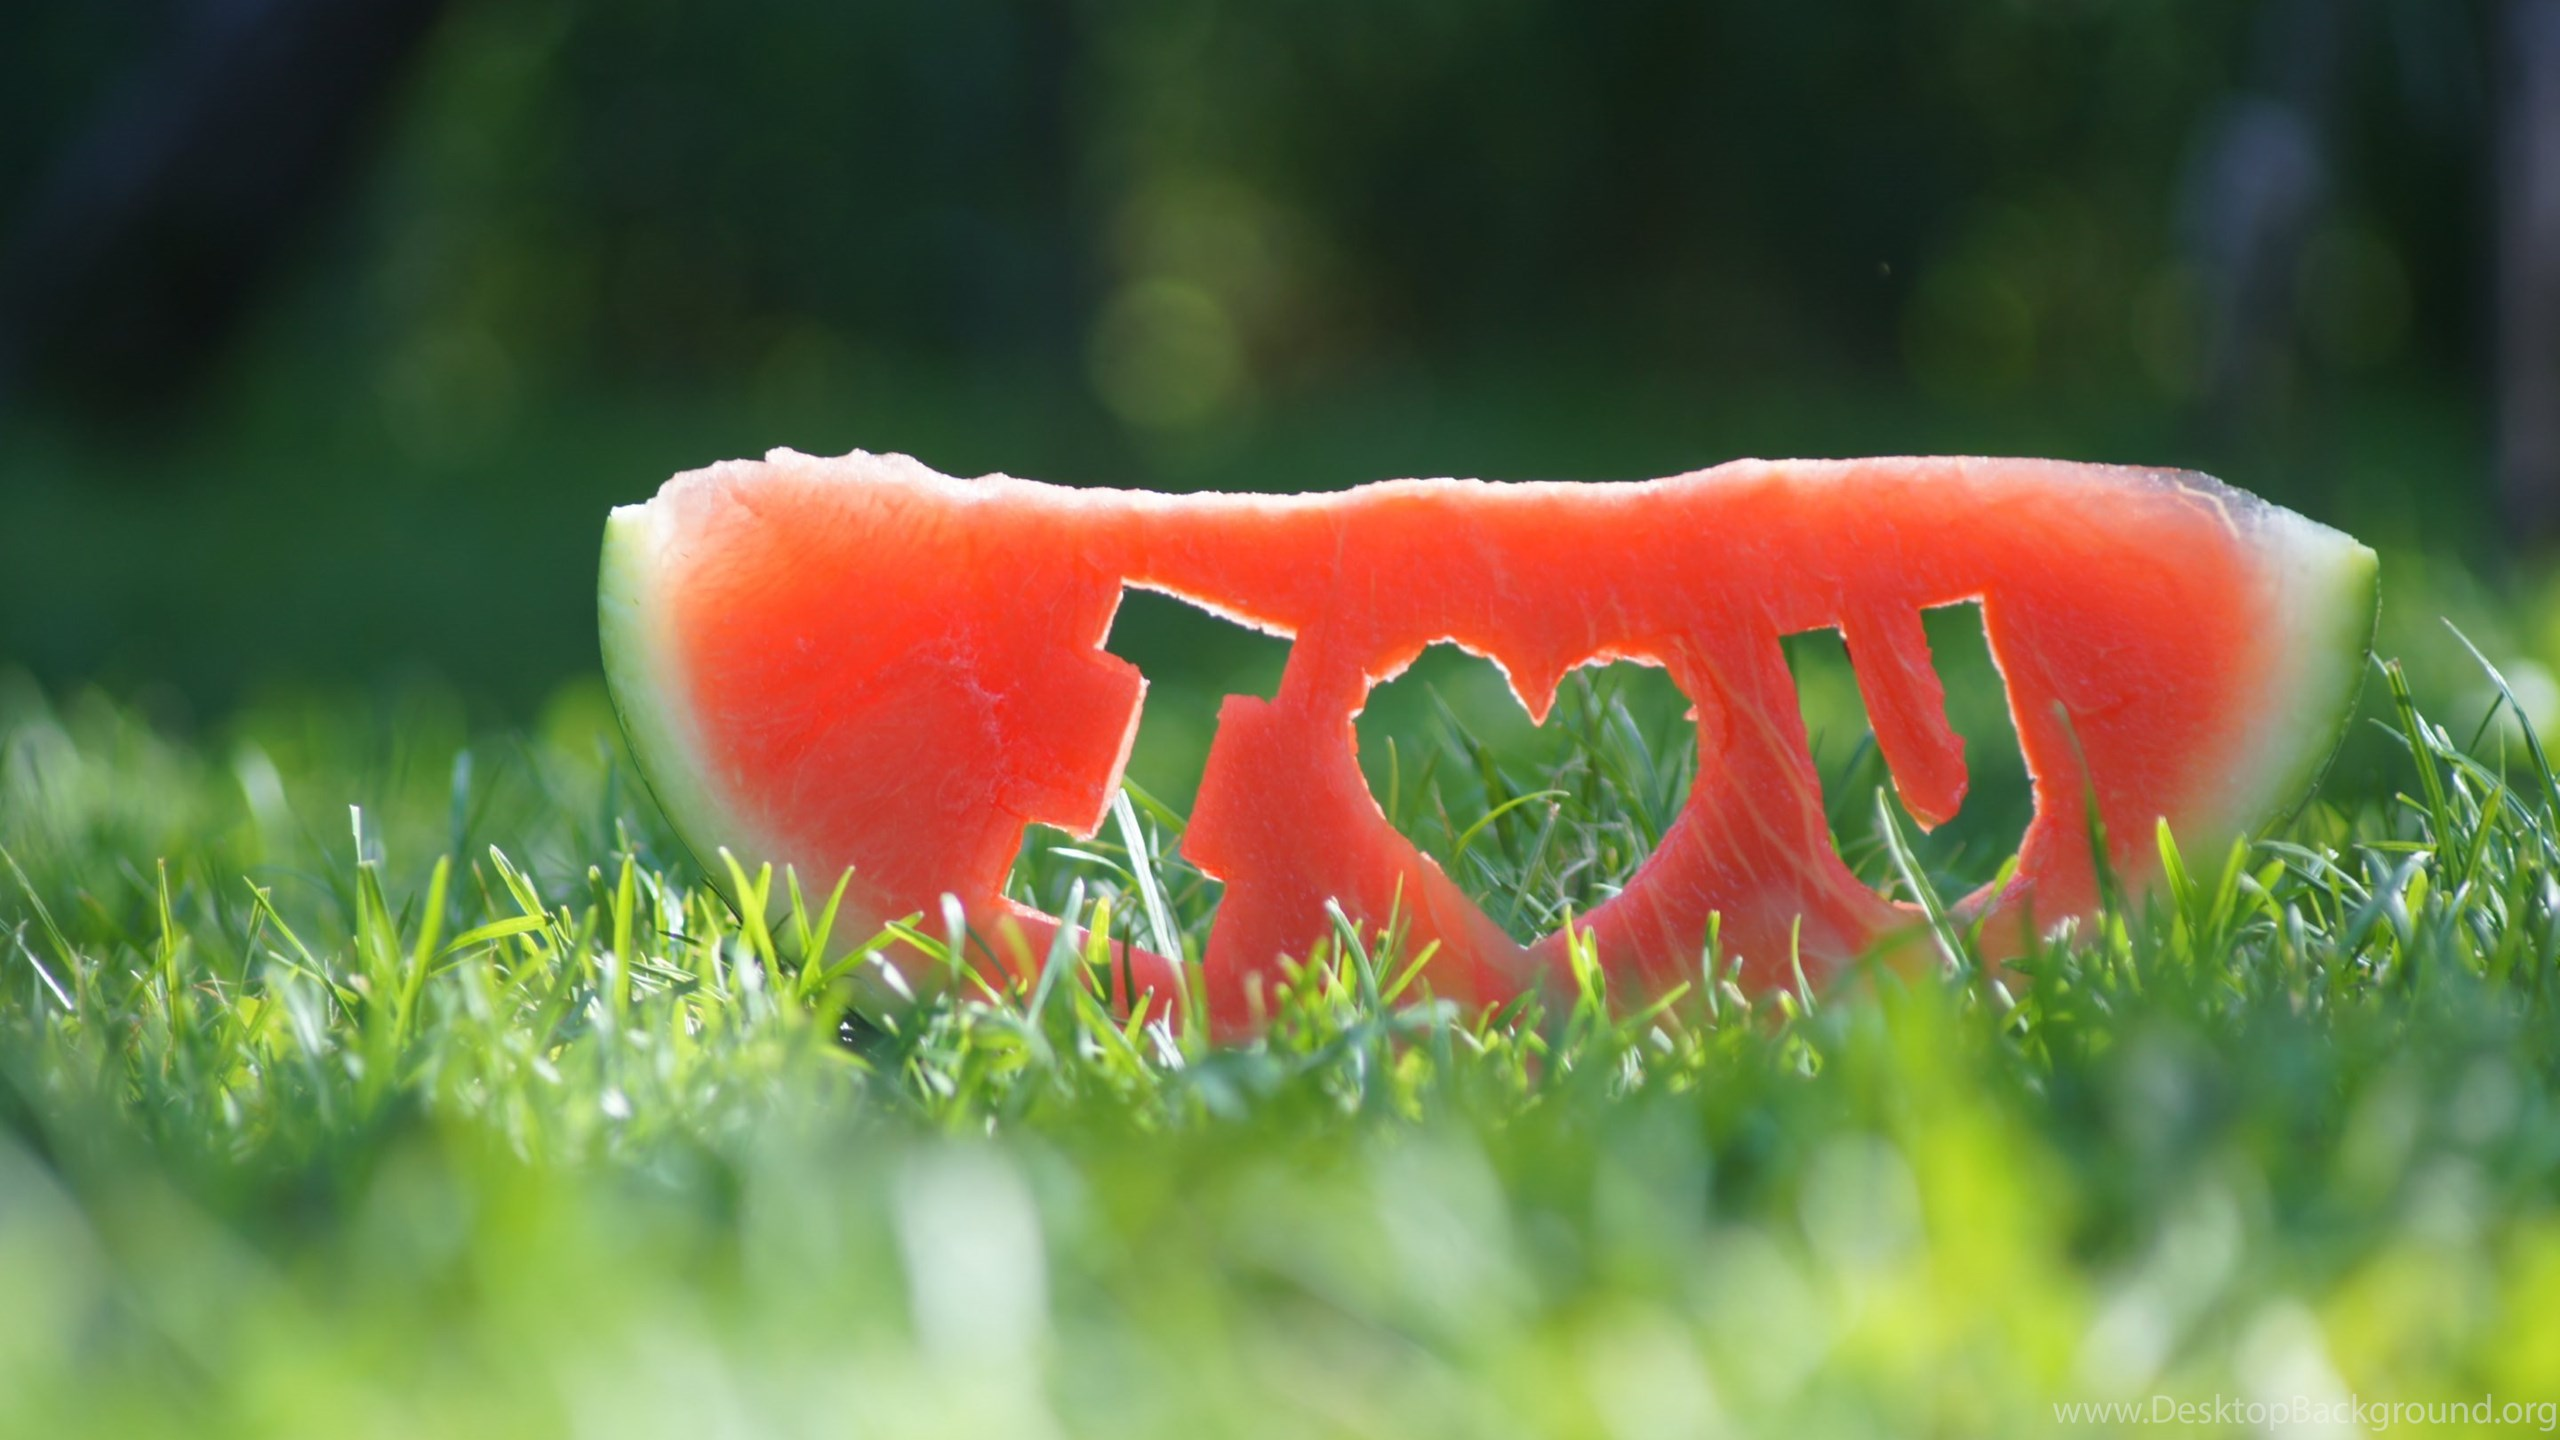 Watermelon I Love You Hd Wallpapers 4k Wallpapers Desktop Background